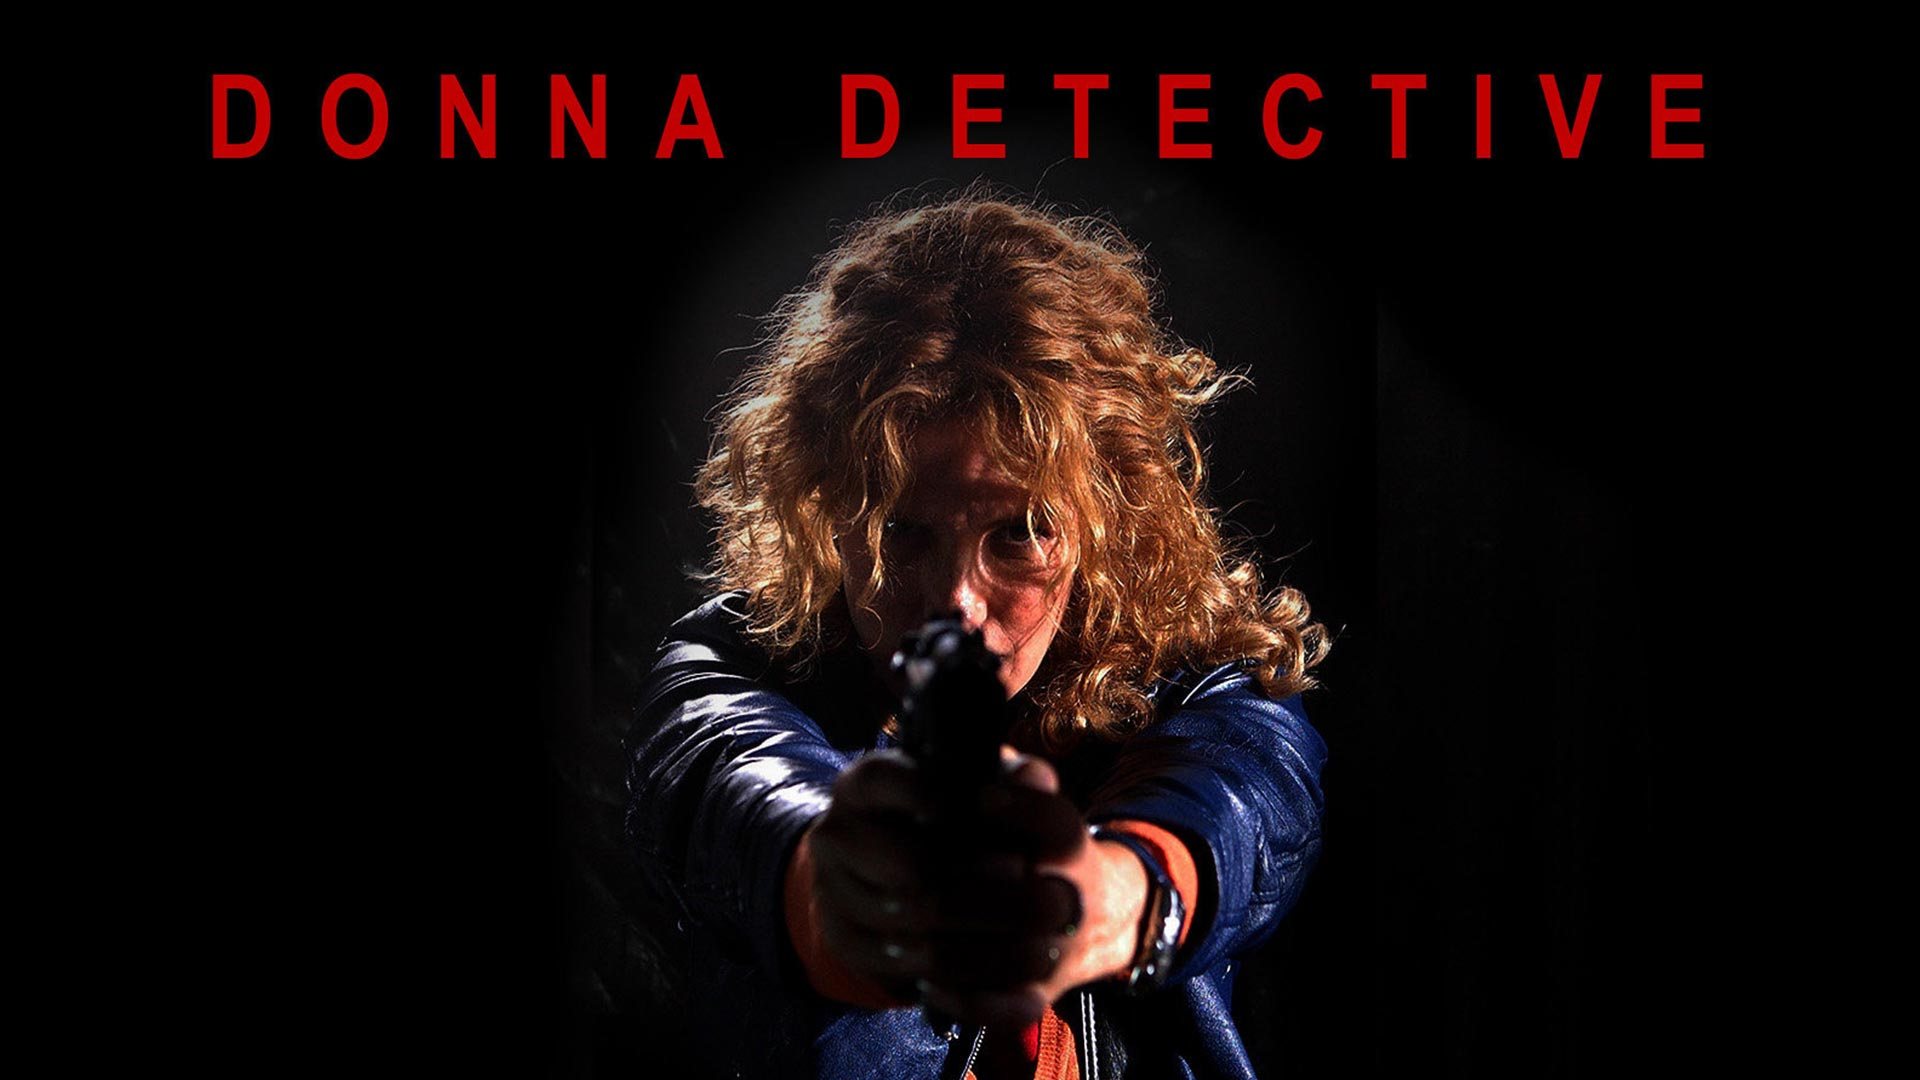 Donna Detective (English subtitled)